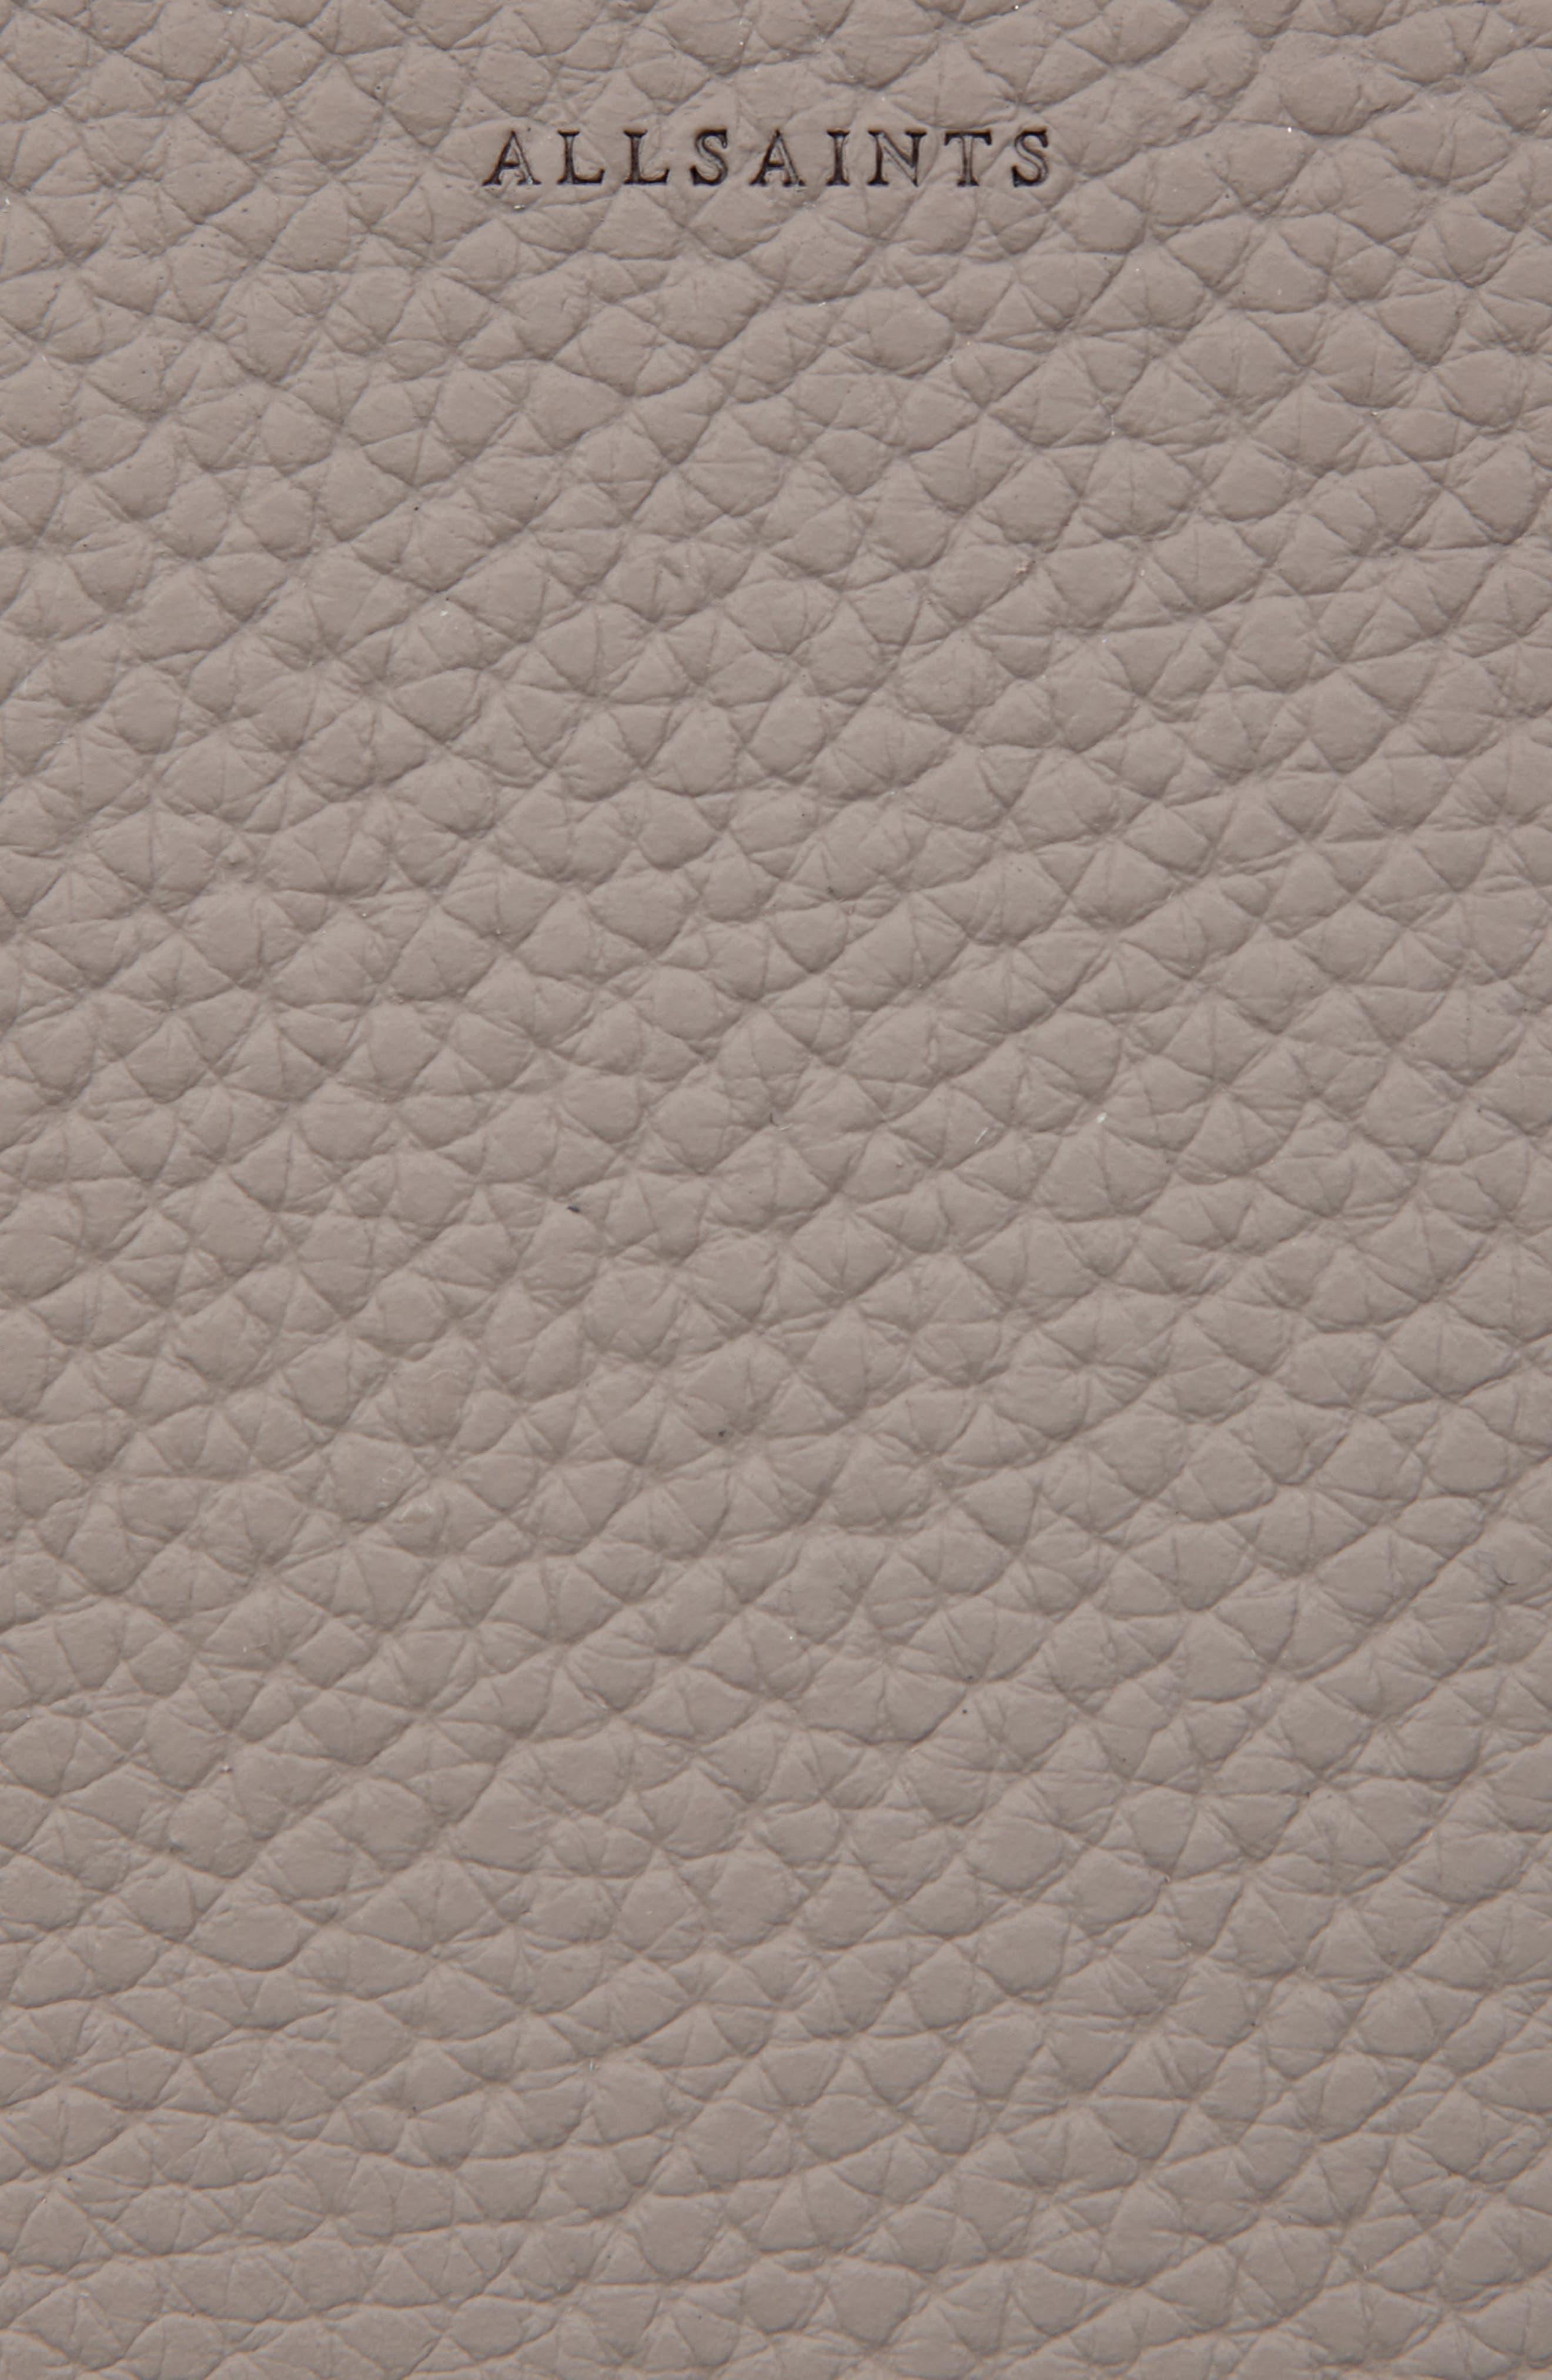 Alternate Image 5  - ALLSAINTS Kita Convertible Leather Backpack